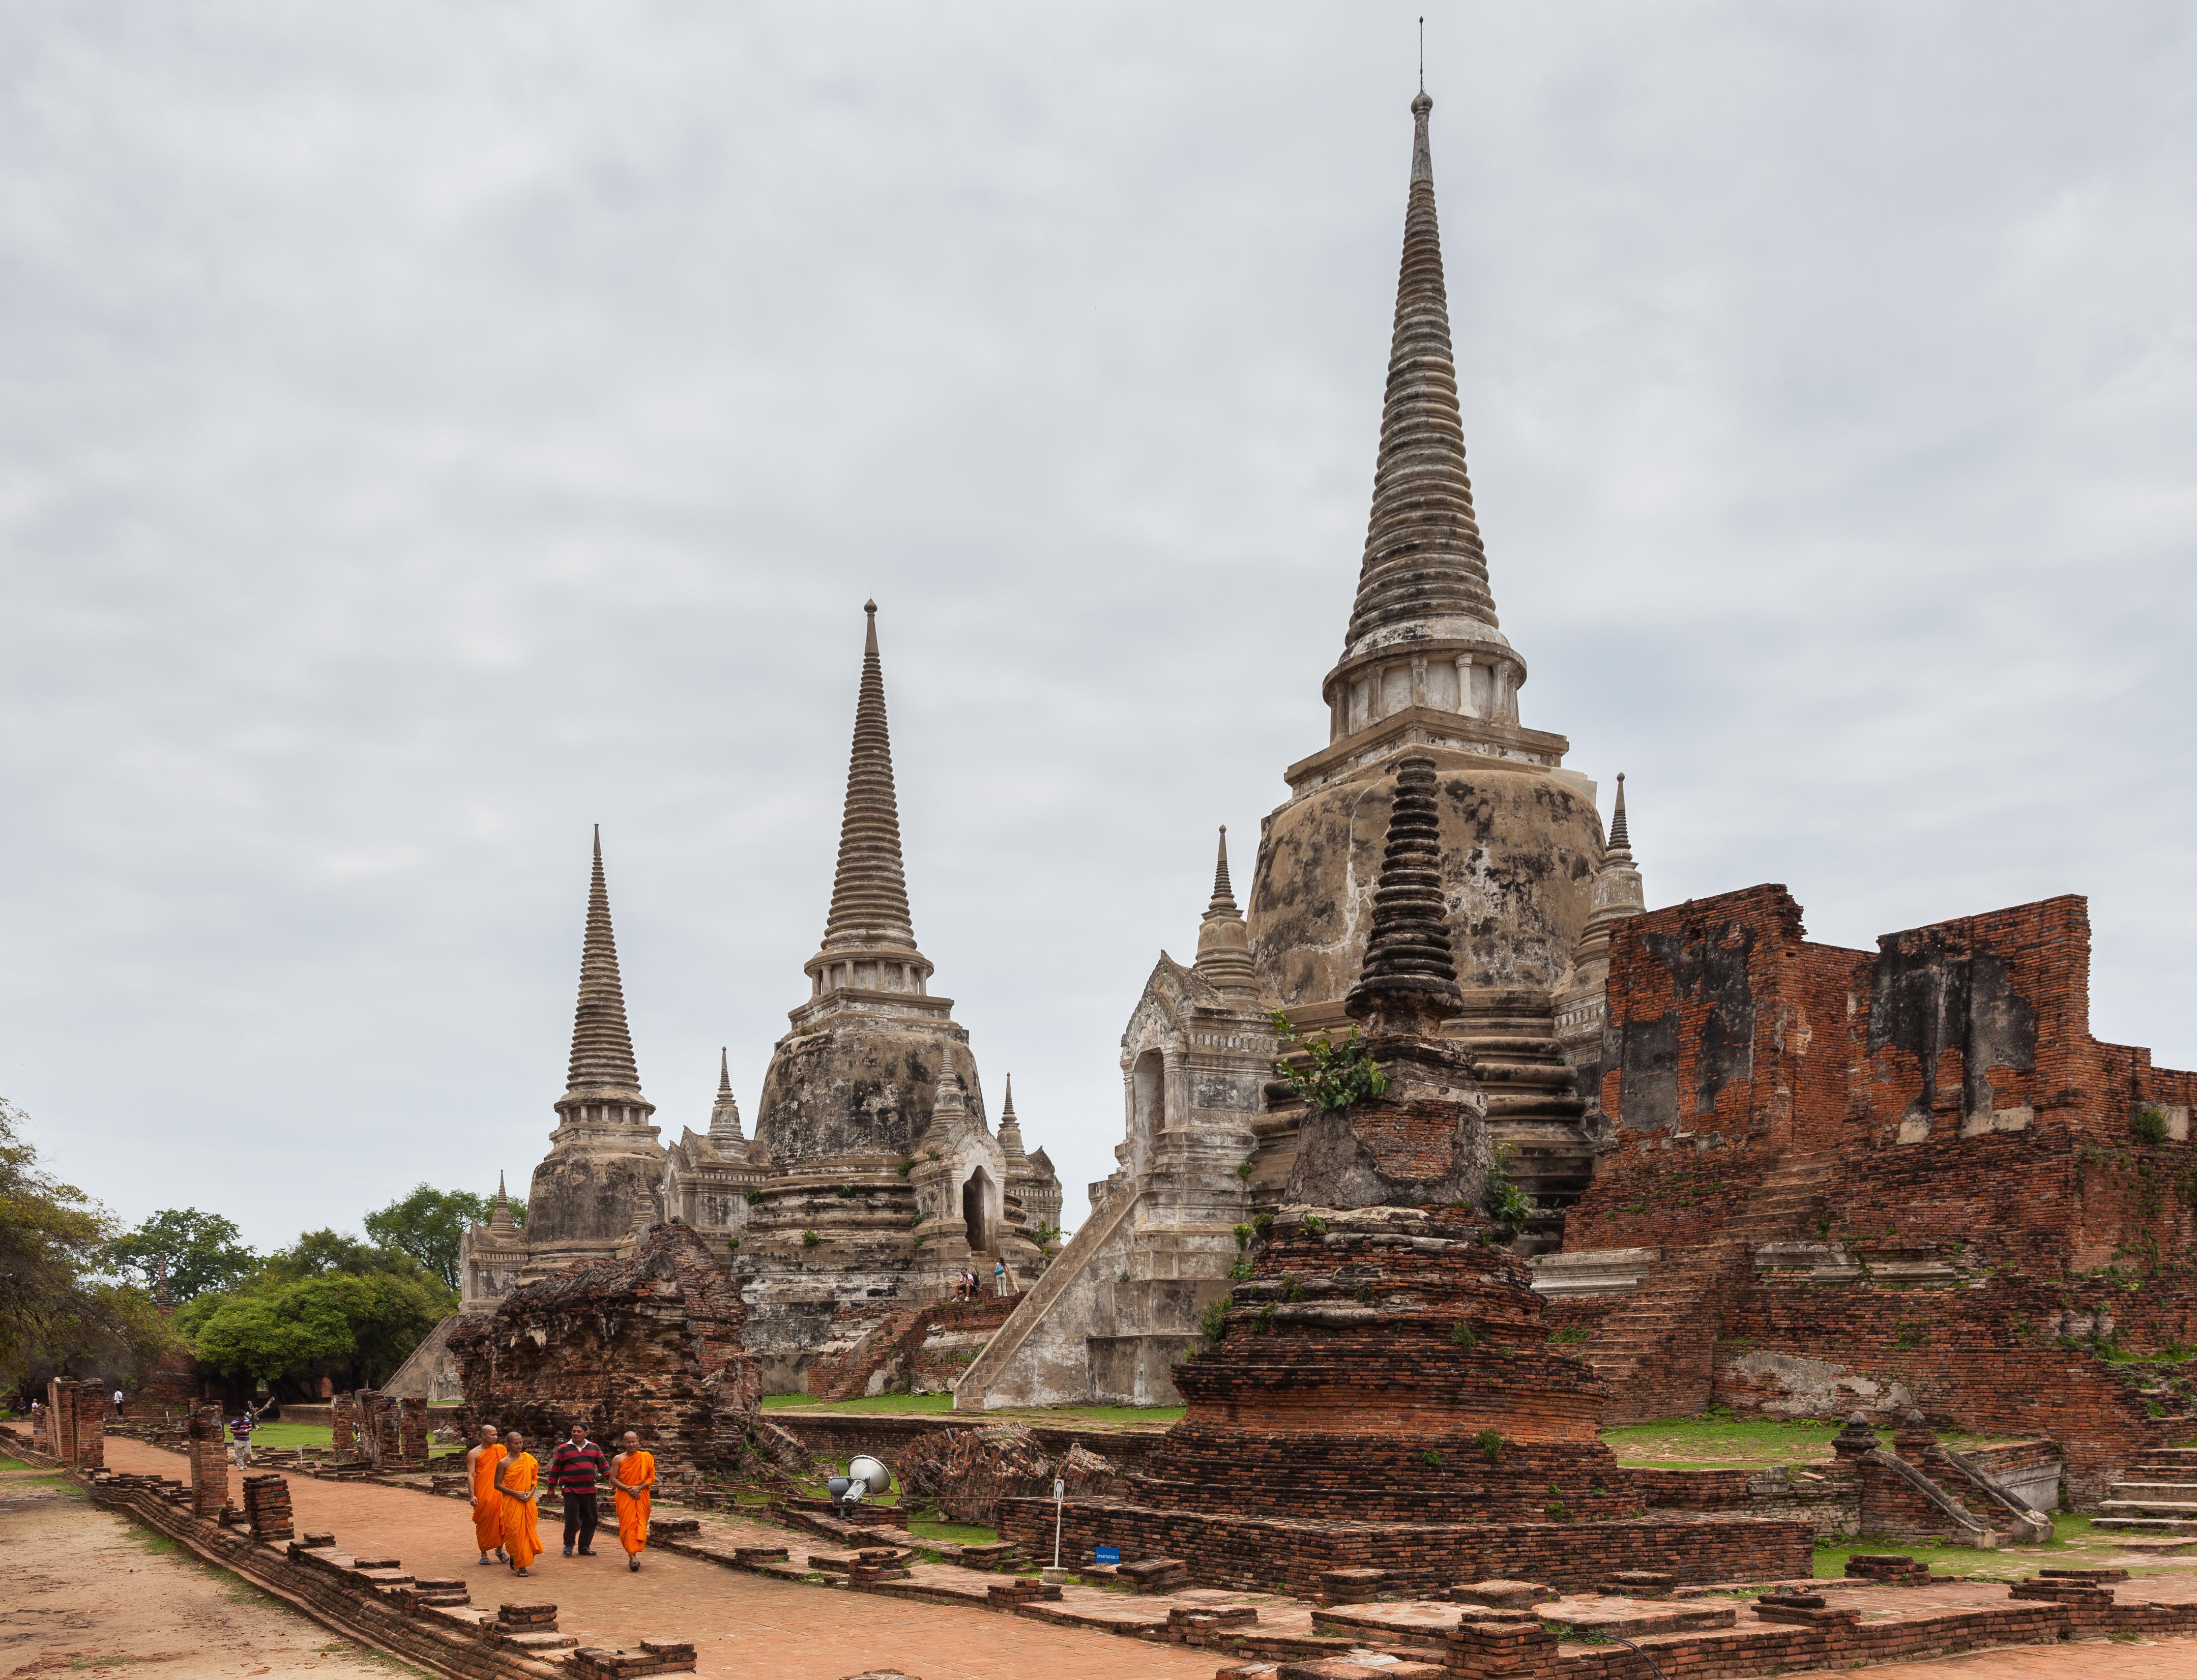 Templo_Phra_Si_Sanphet,_Ayutthaya,_Tailandia,_2013-08-23,_DD_16.jpg